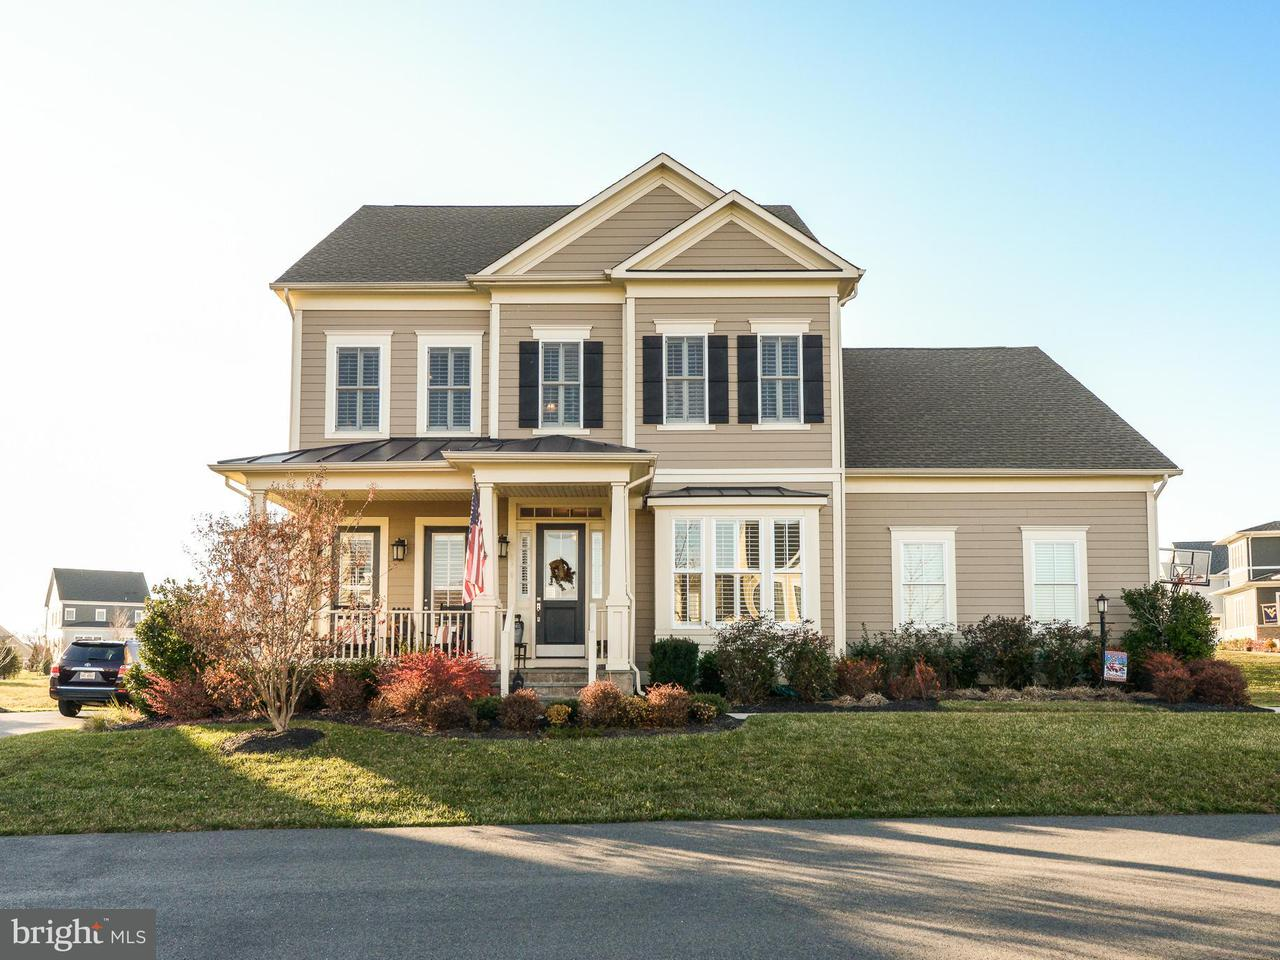 Single Family Home for Sale at 23705 LENTILS Lane 23705 LENTILS Lane Ashburn, Virginia 20148 United States